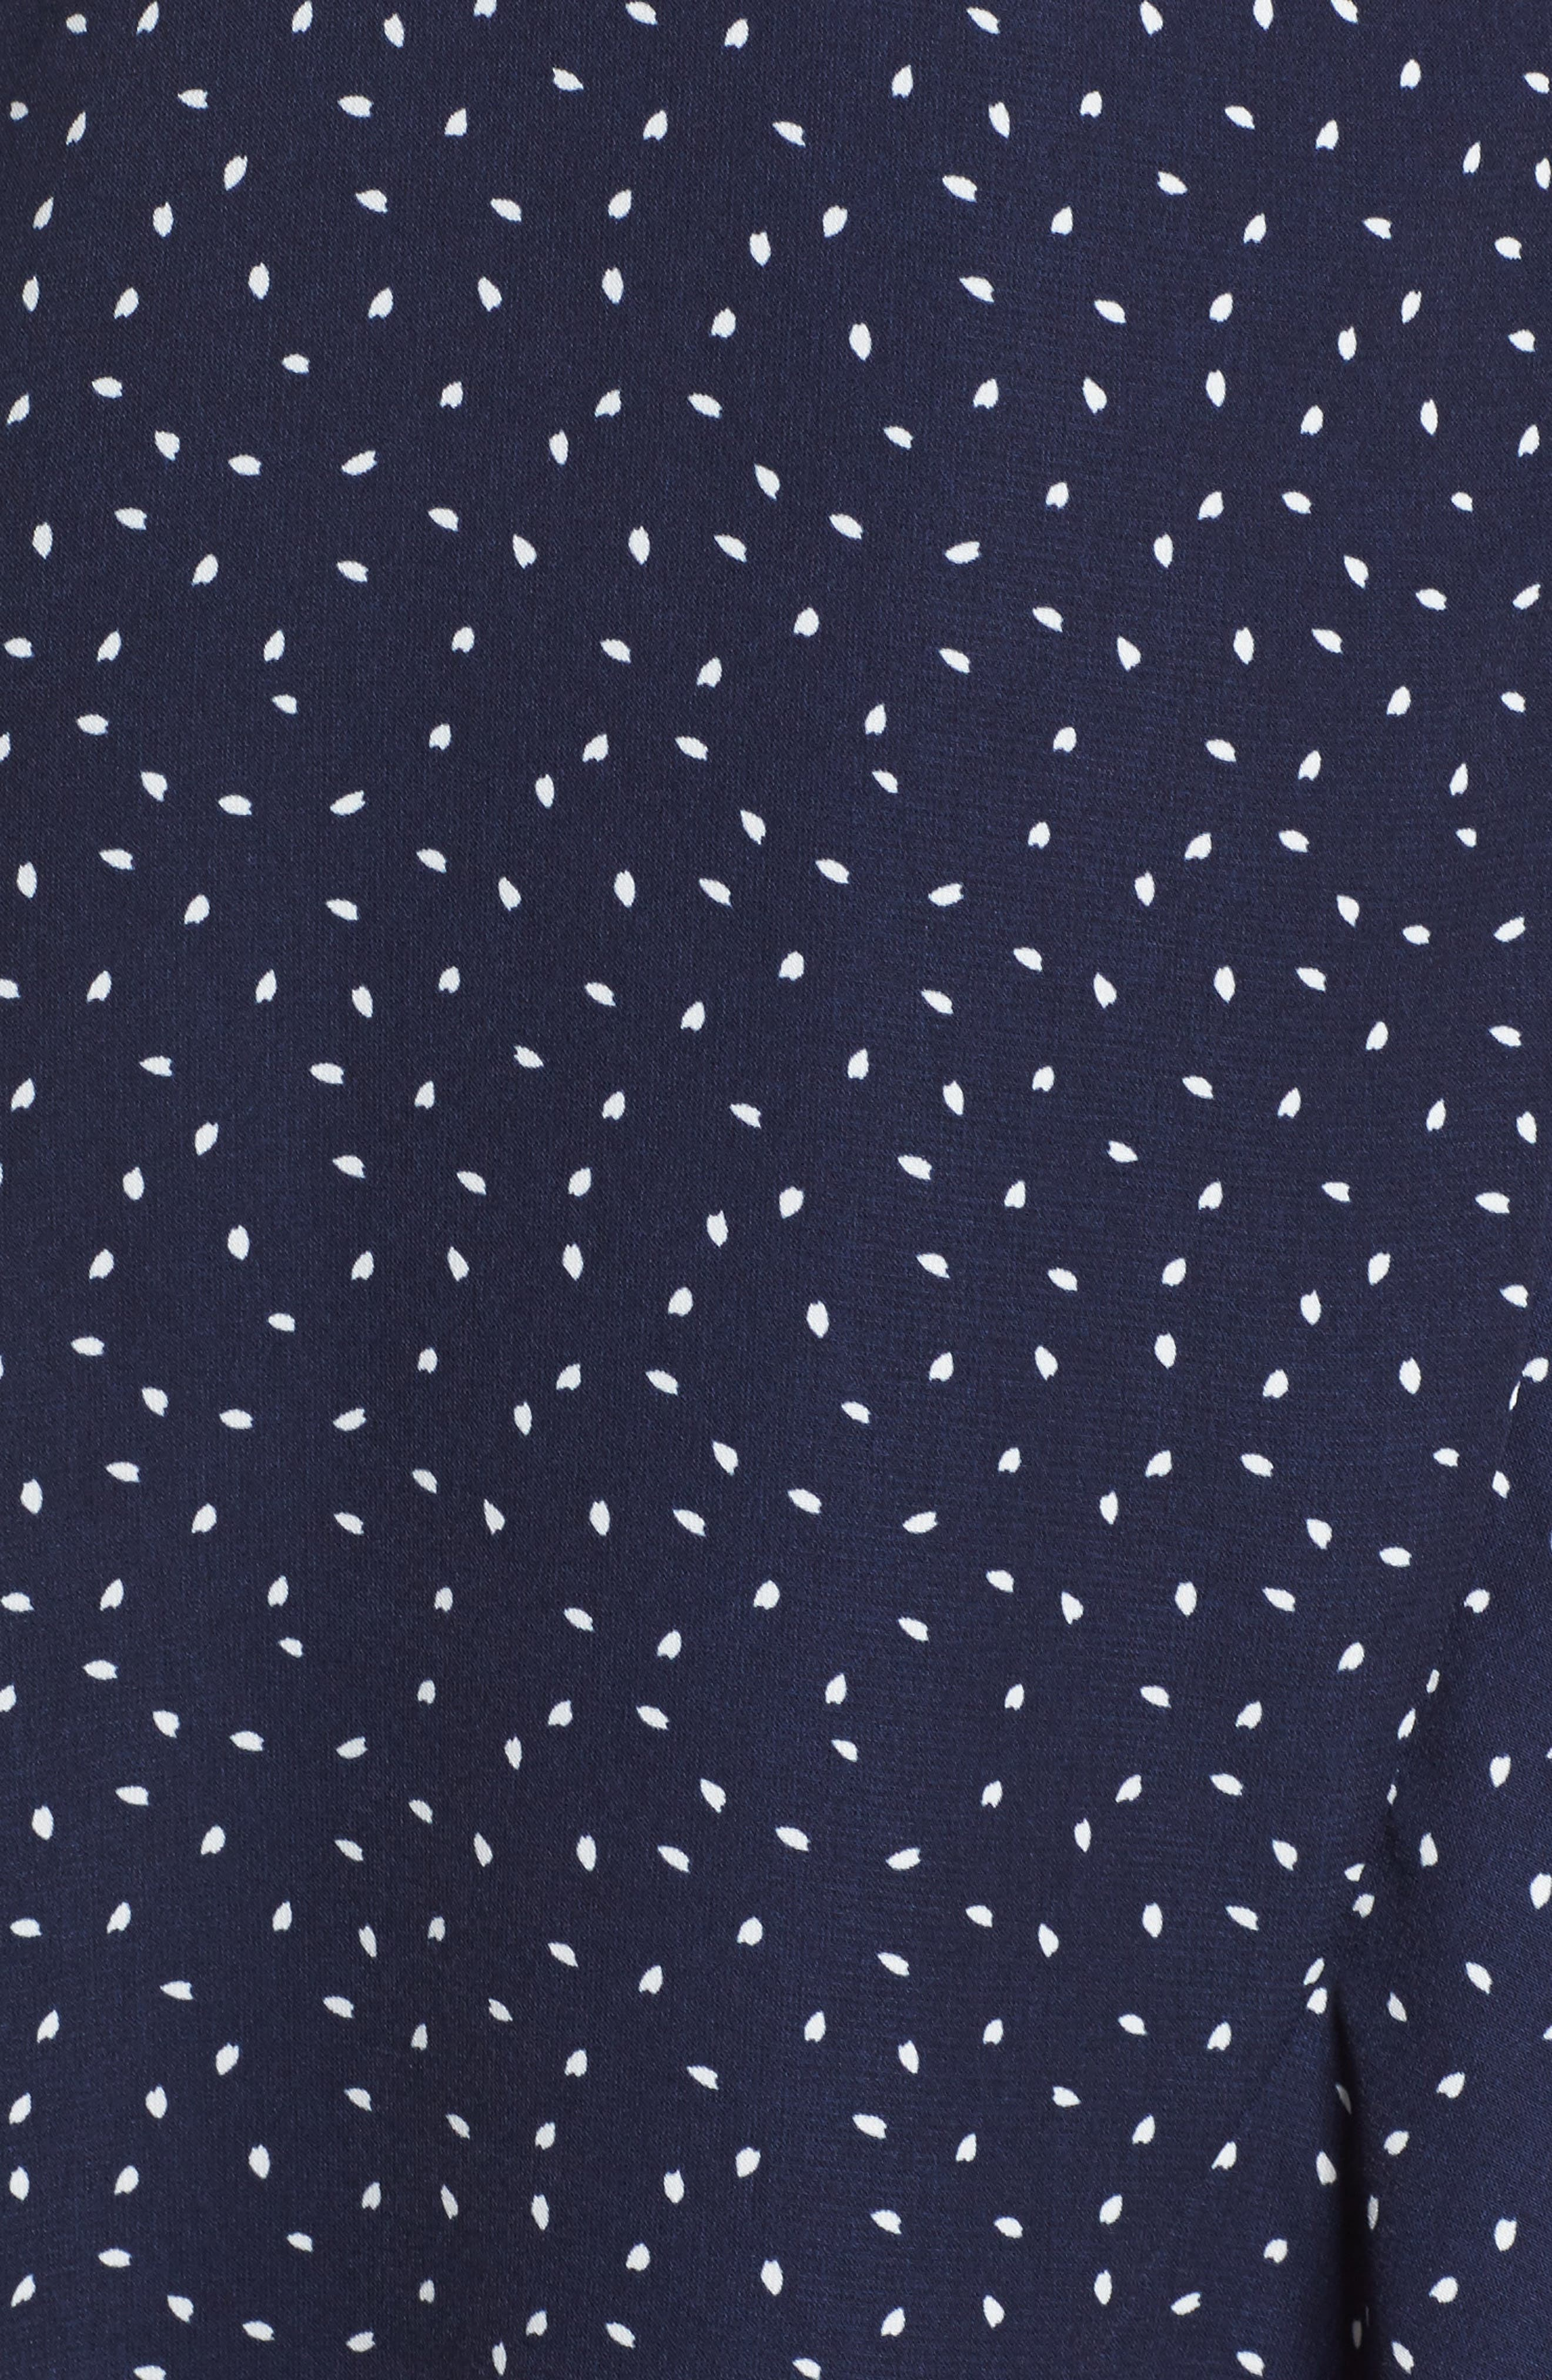 Print Wrap Dress,                             Alternate thumbnail 5, color,